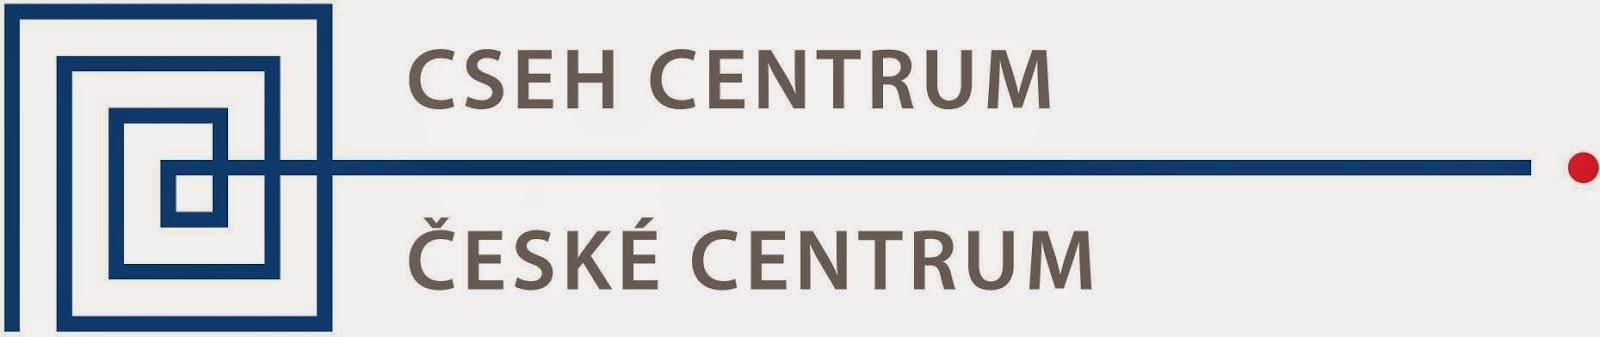 CSEH CENTRUM